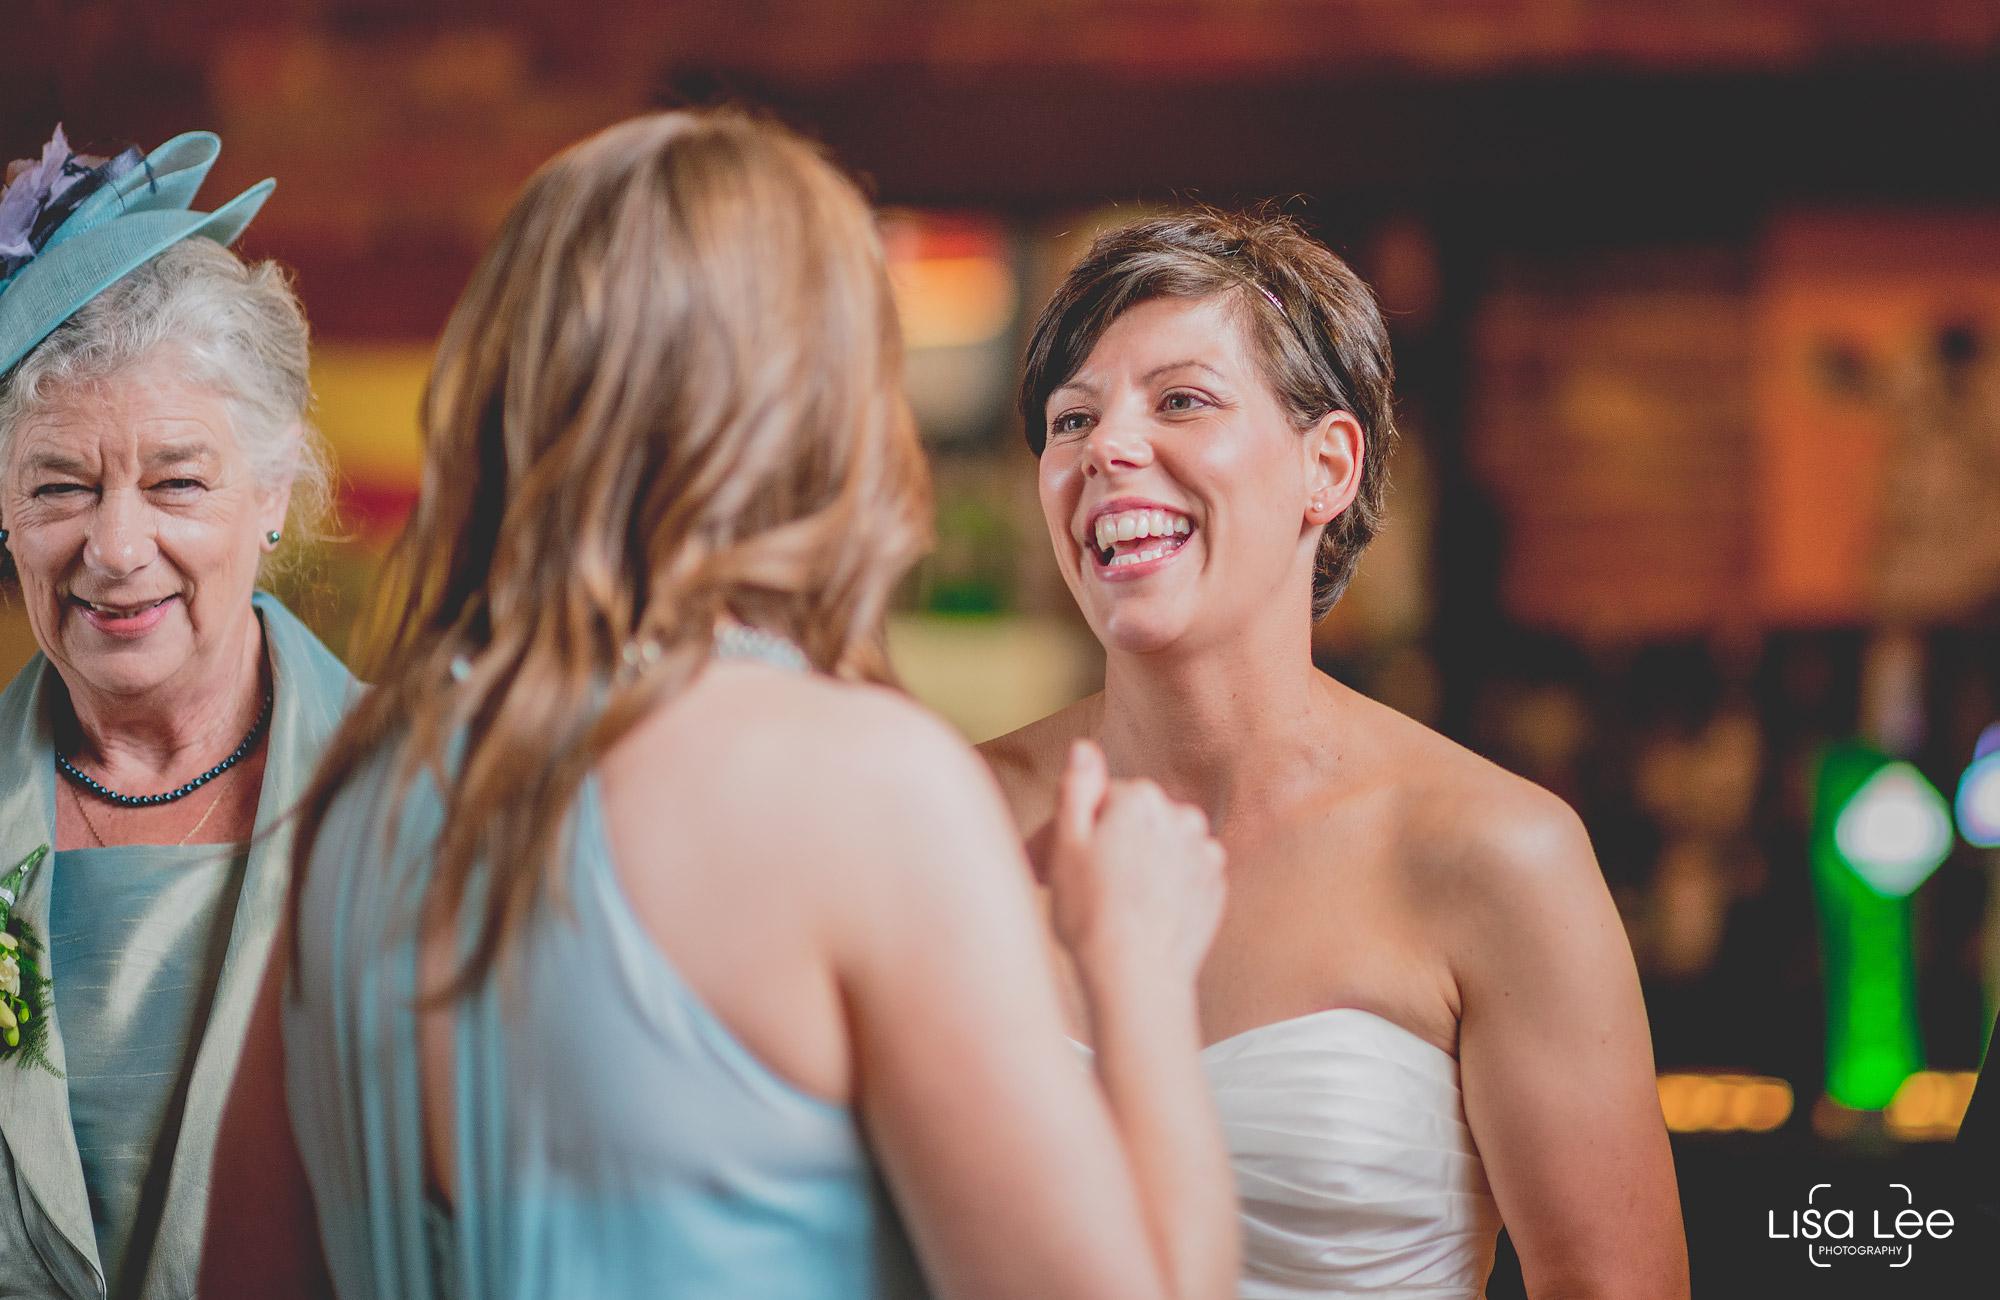 lisa-lee-wedding-photography-burton-lineup.jpg